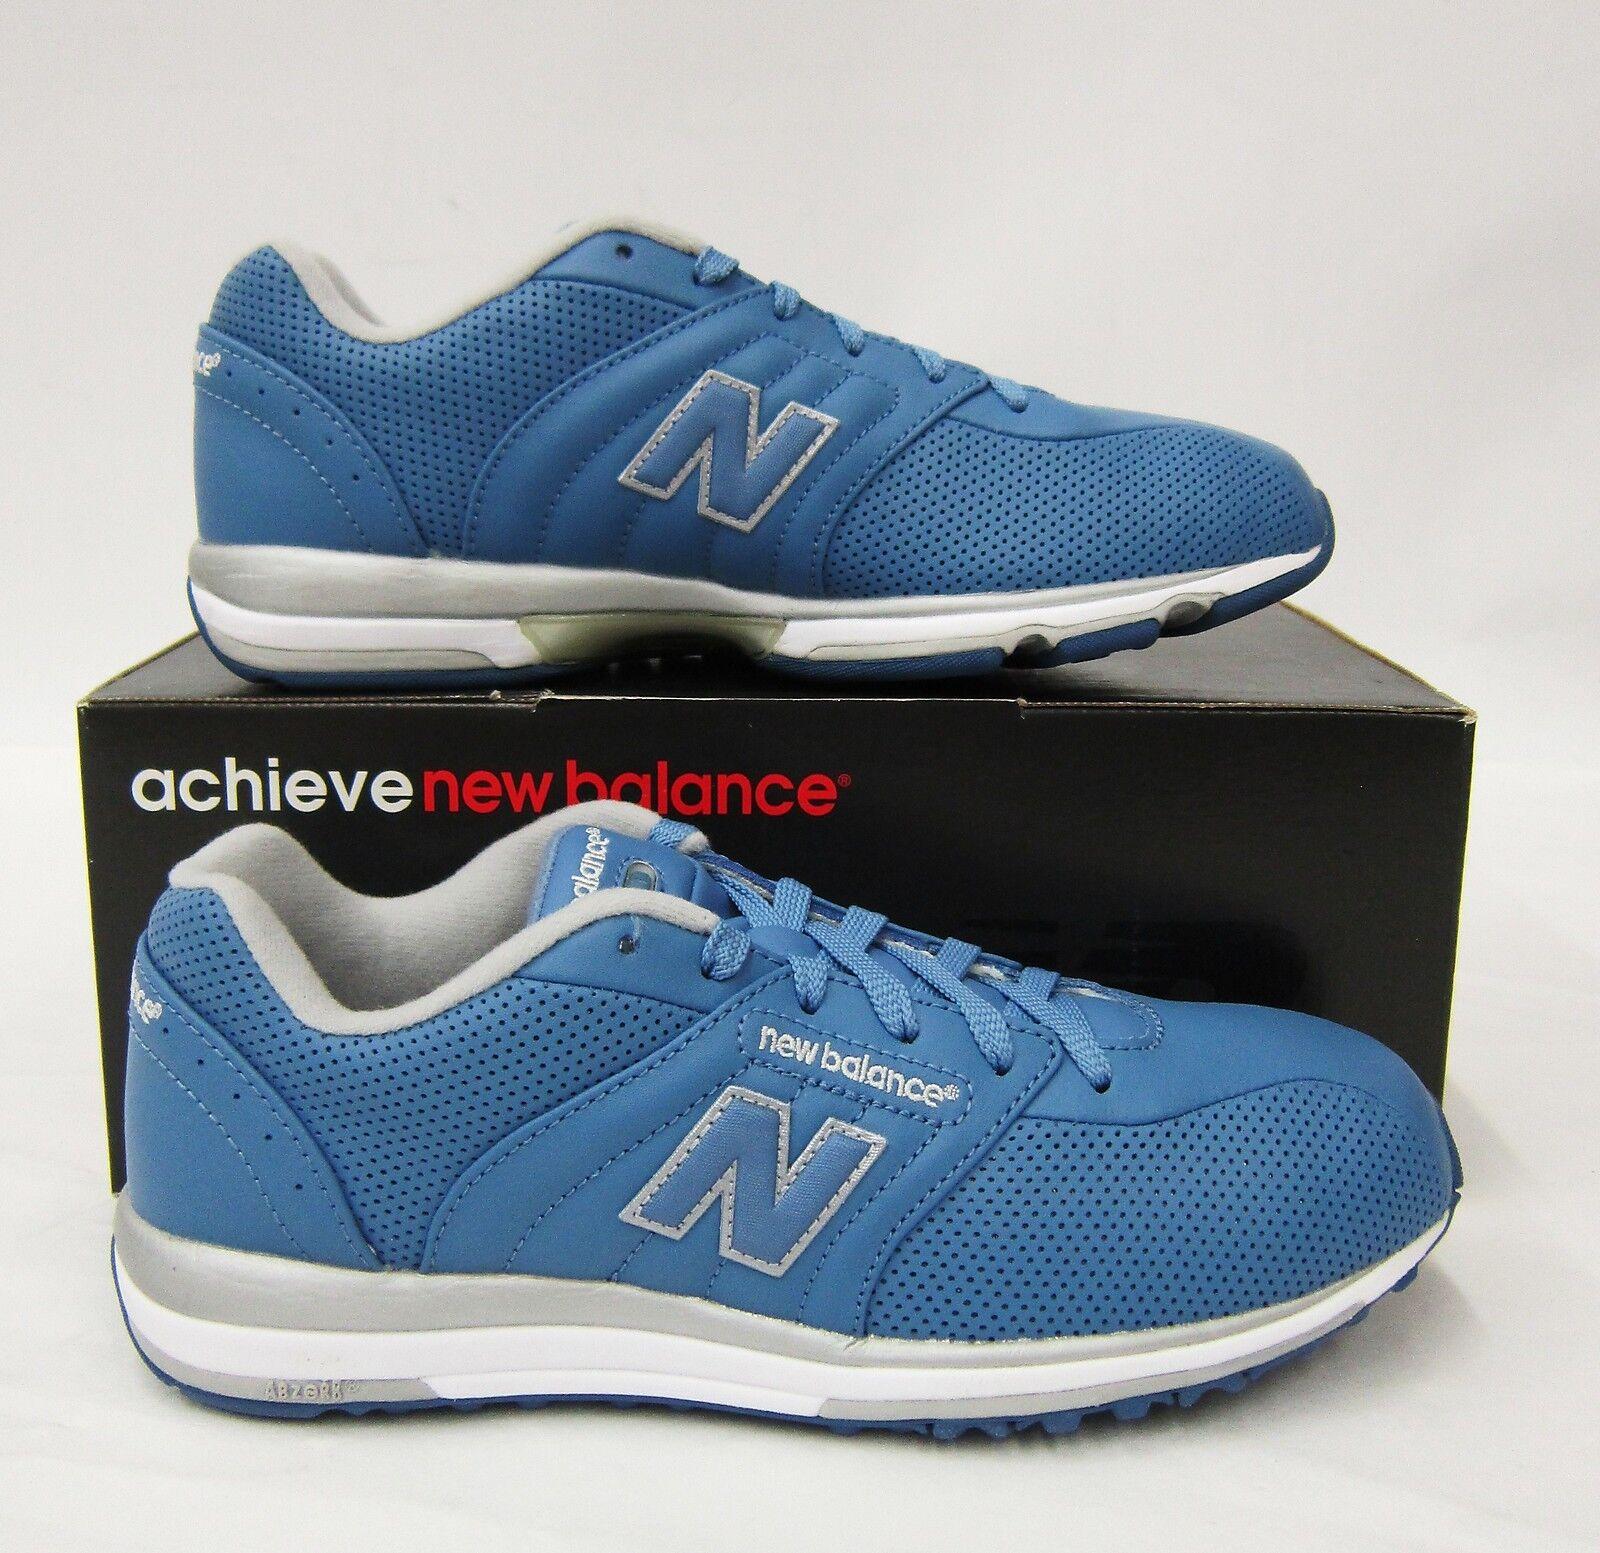 New Schuh Balance Sneaker Schuh New Blau / Silber #5001 b09408